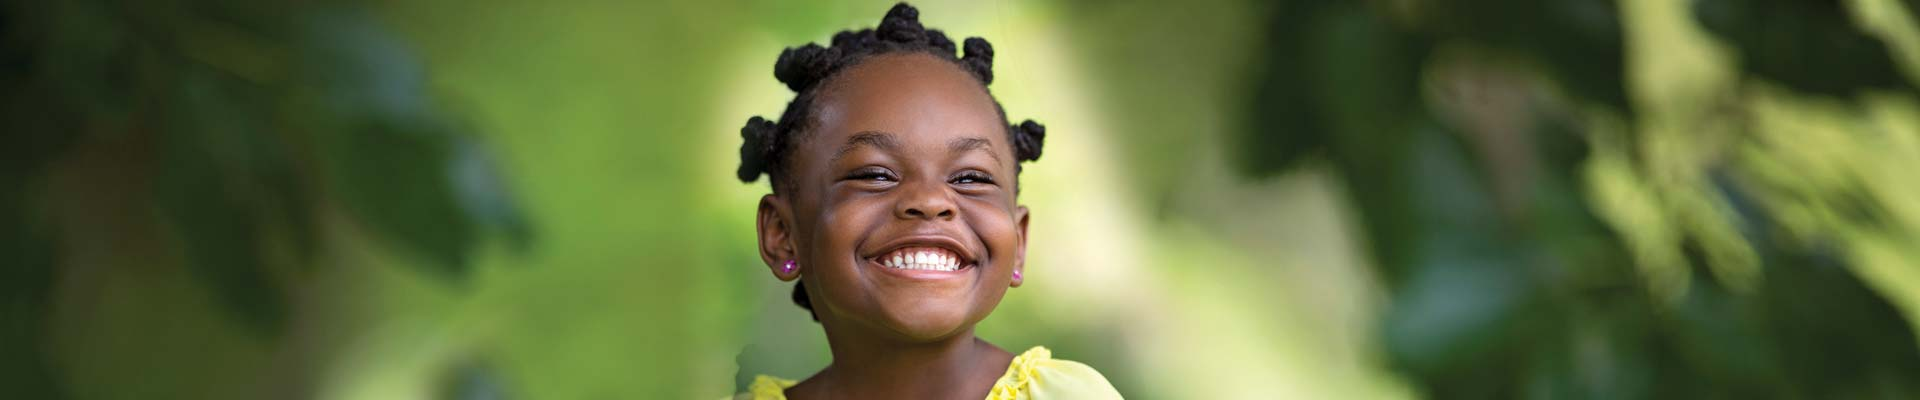 Pediatric Dentistry at Bright Smiles Kids Dentistry Harleysville Doylestown Devon PA